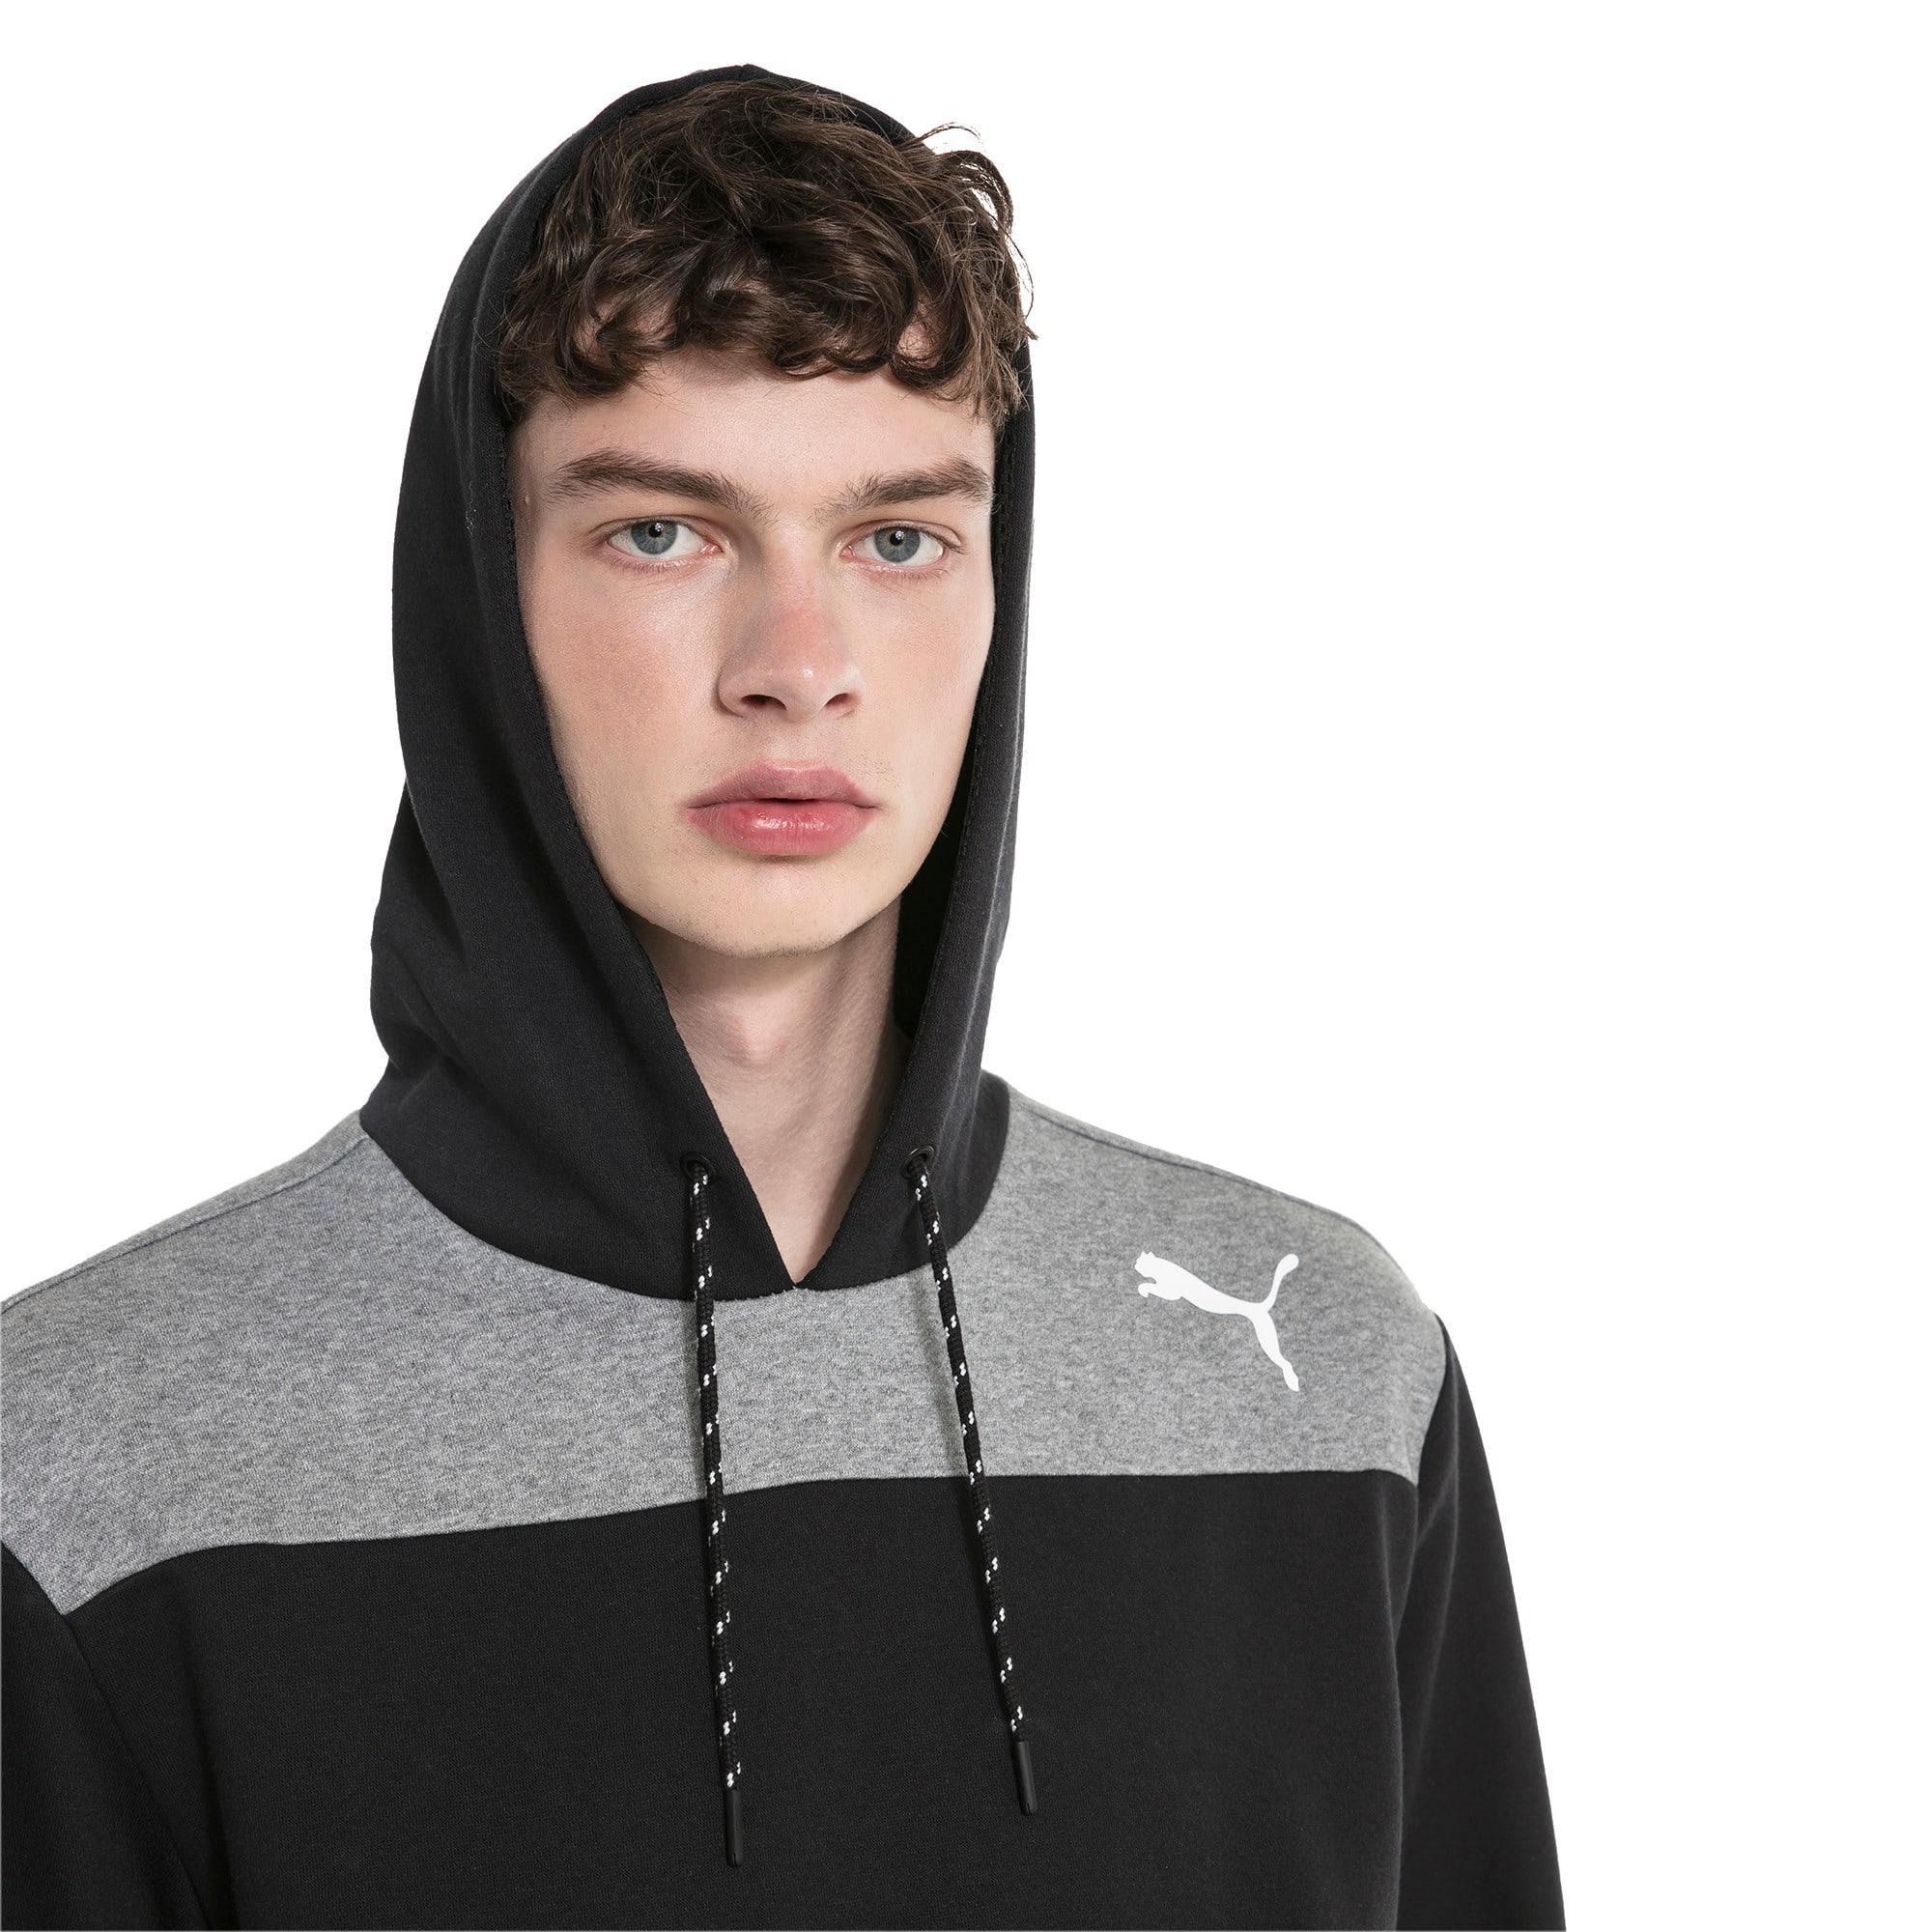 Thumbnail 4 of Modern Sports Men's Fleece Hoodie, Puma Black, medium